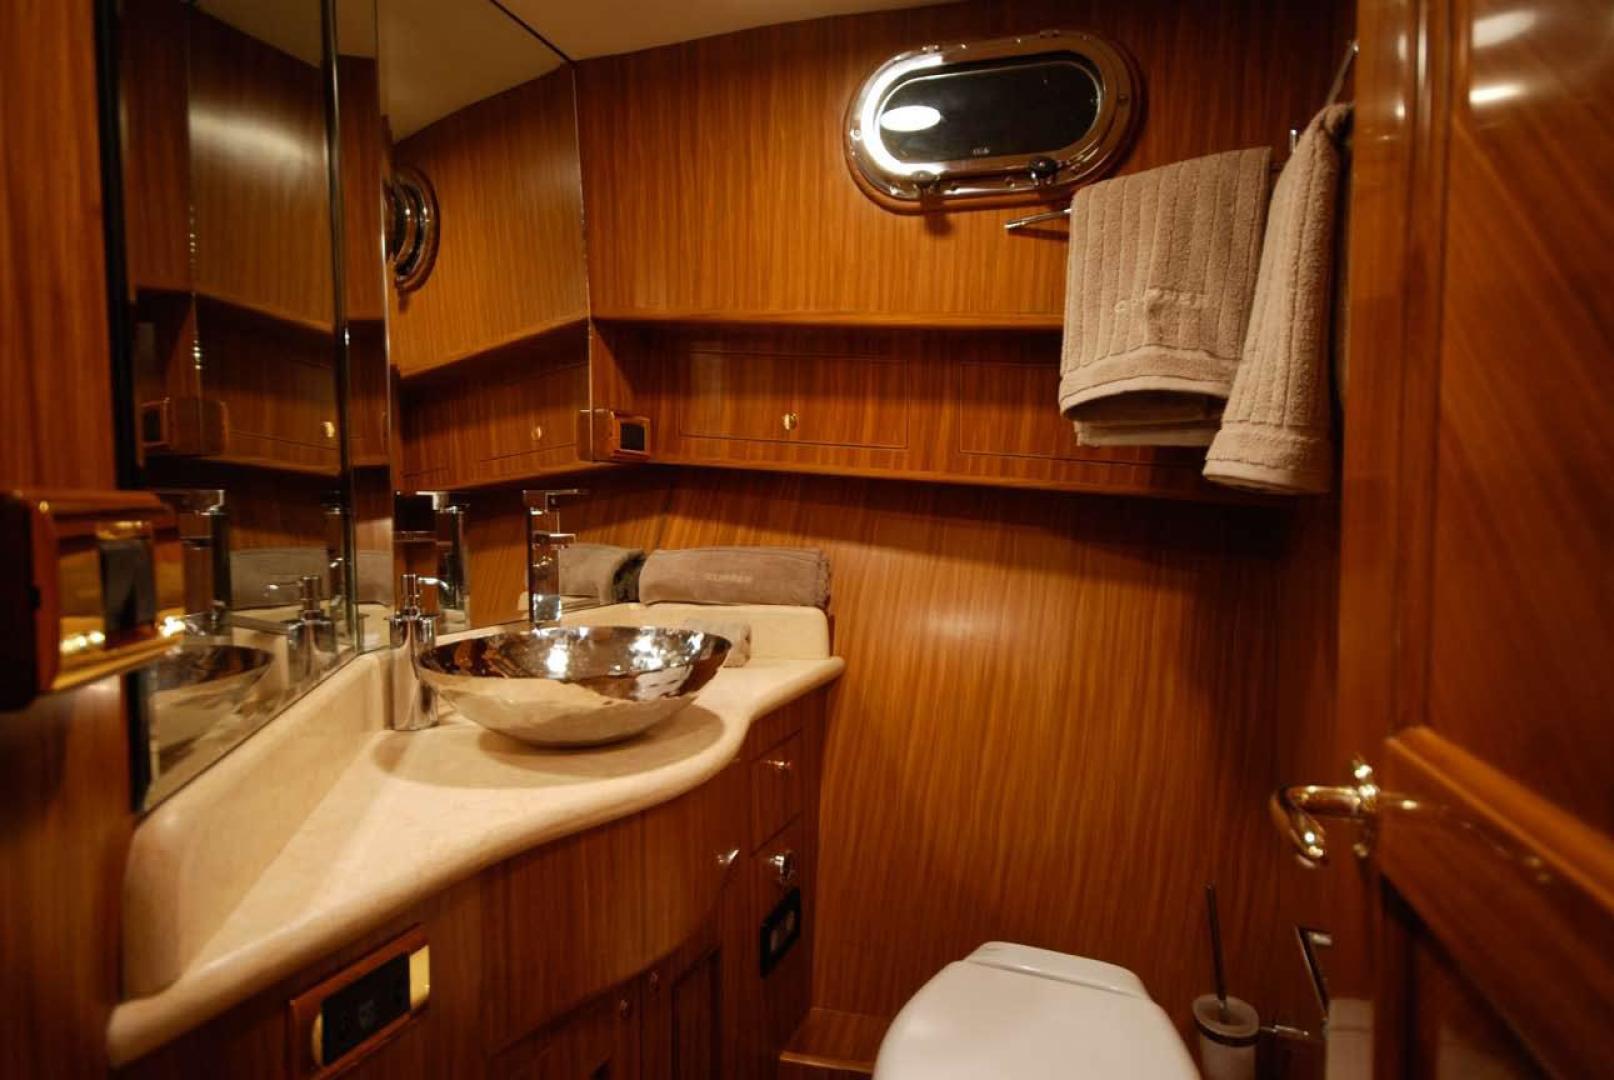 Clipper Motor Yachts-Cordova 52 2011 -Unknown-Singapore-Manufacturer Provided Image: Cordova 52-385780 | Thumbnail